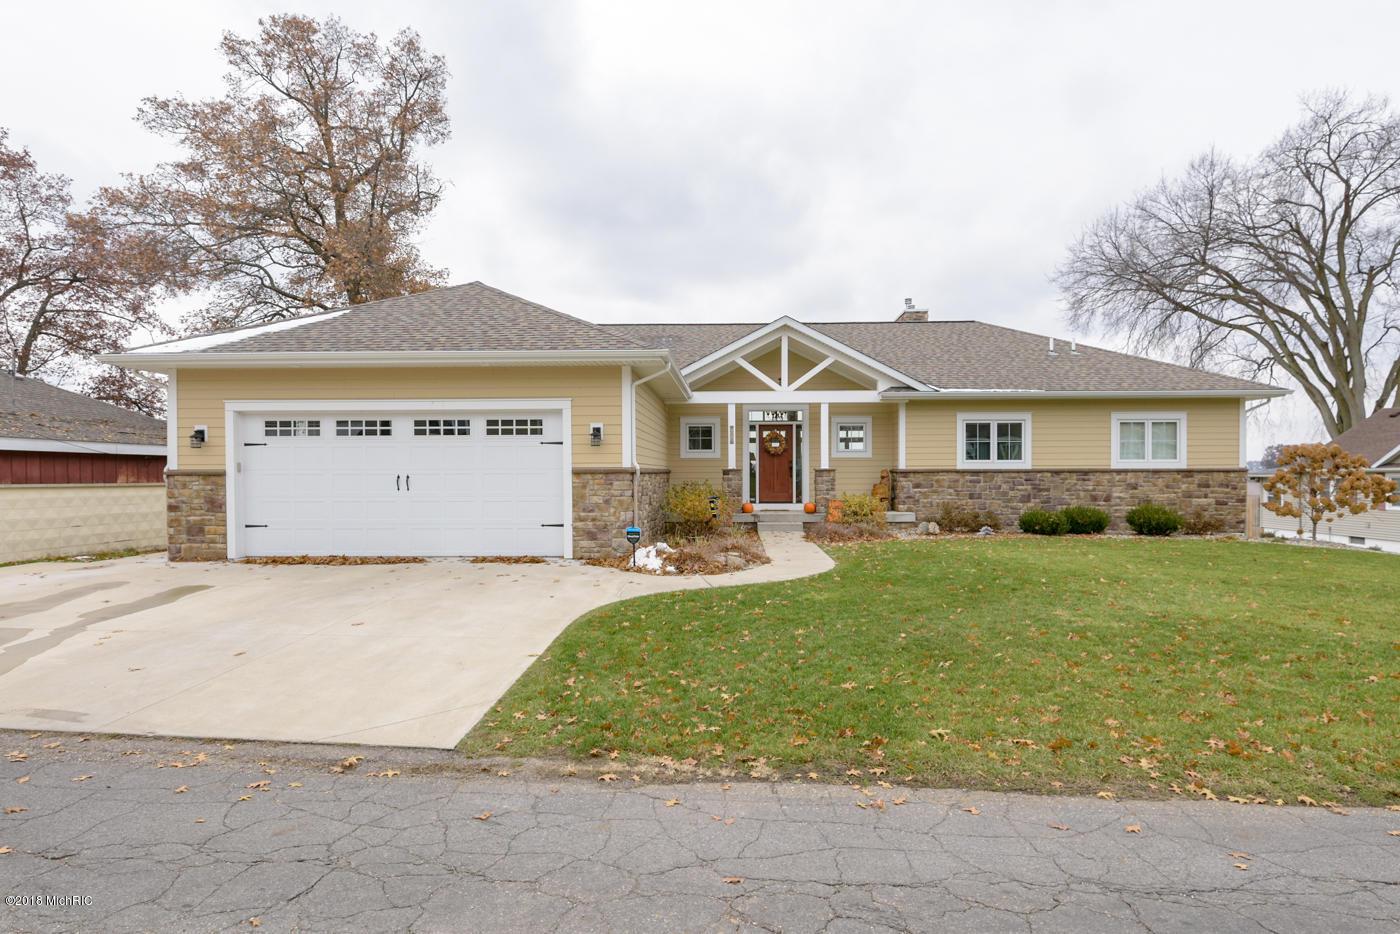 ceresco mi real estate listings and ceresco homes for sale